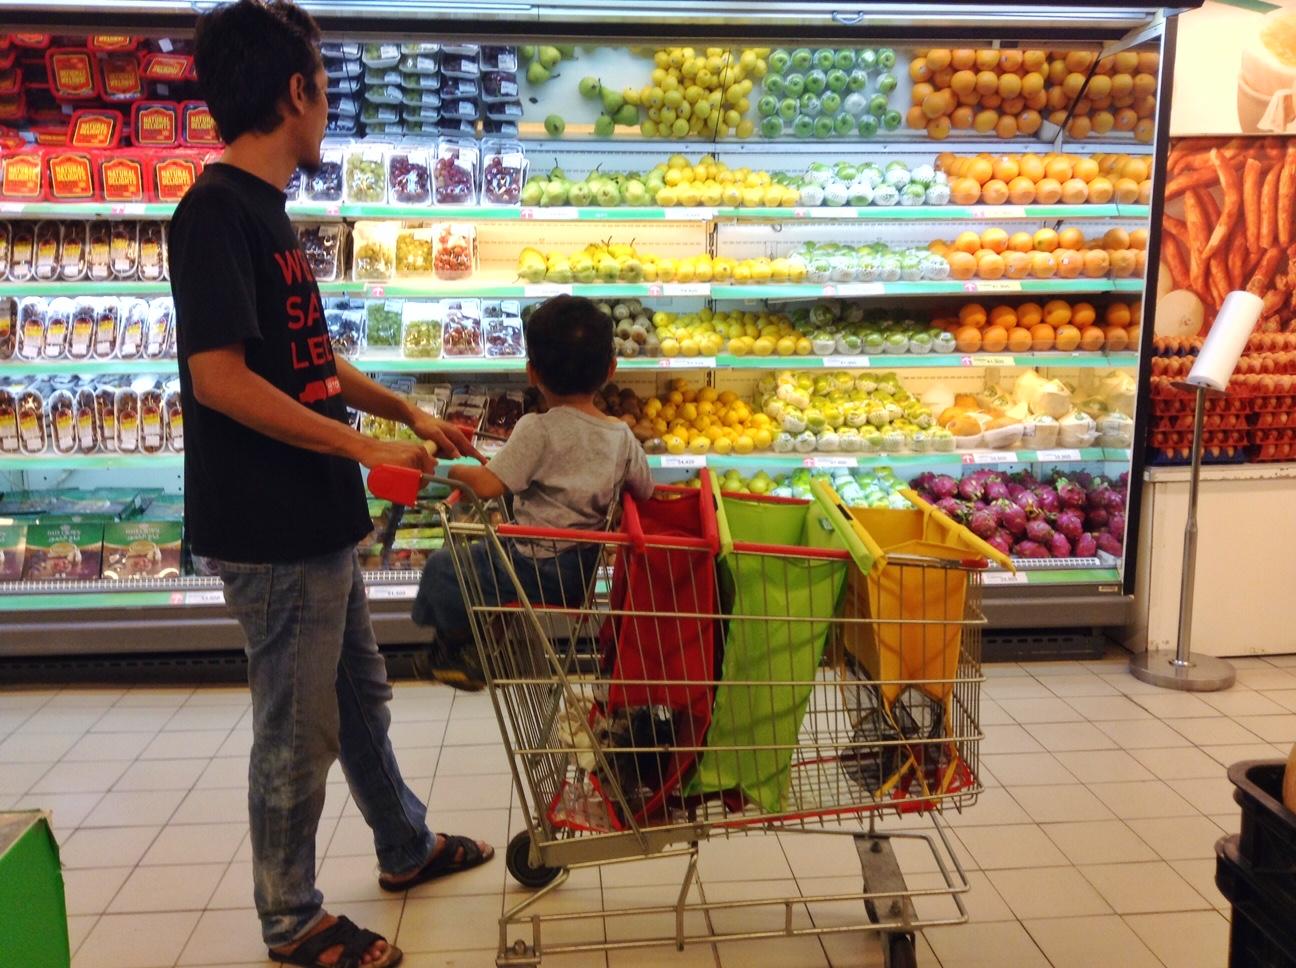 CeRiTa CHa 5 Alasan Kenapa Saya Suka Belanja Di Carrefour